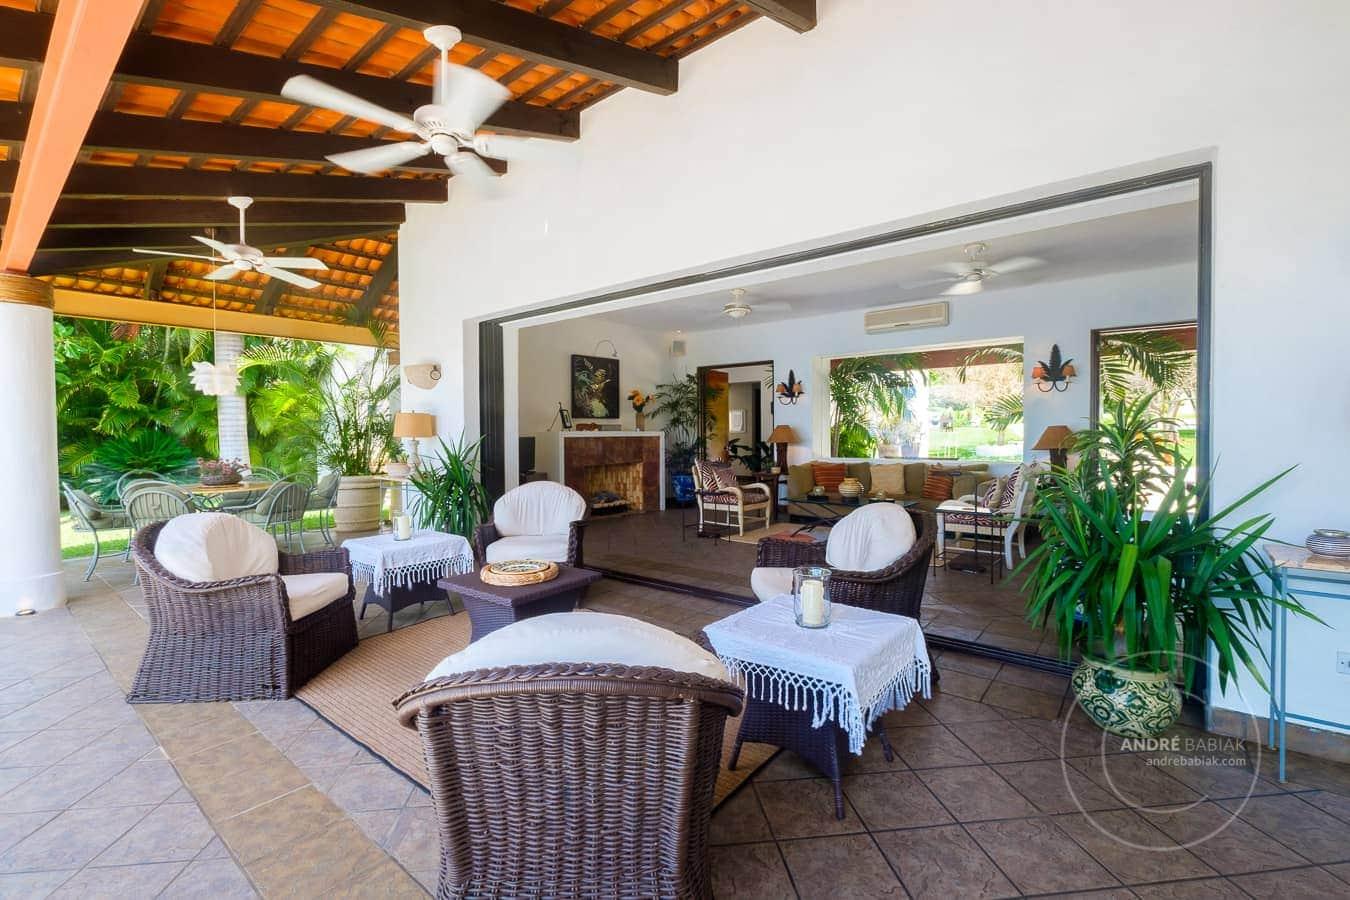 Architecture And Real Estate Photographer Puerto Vallarta 20